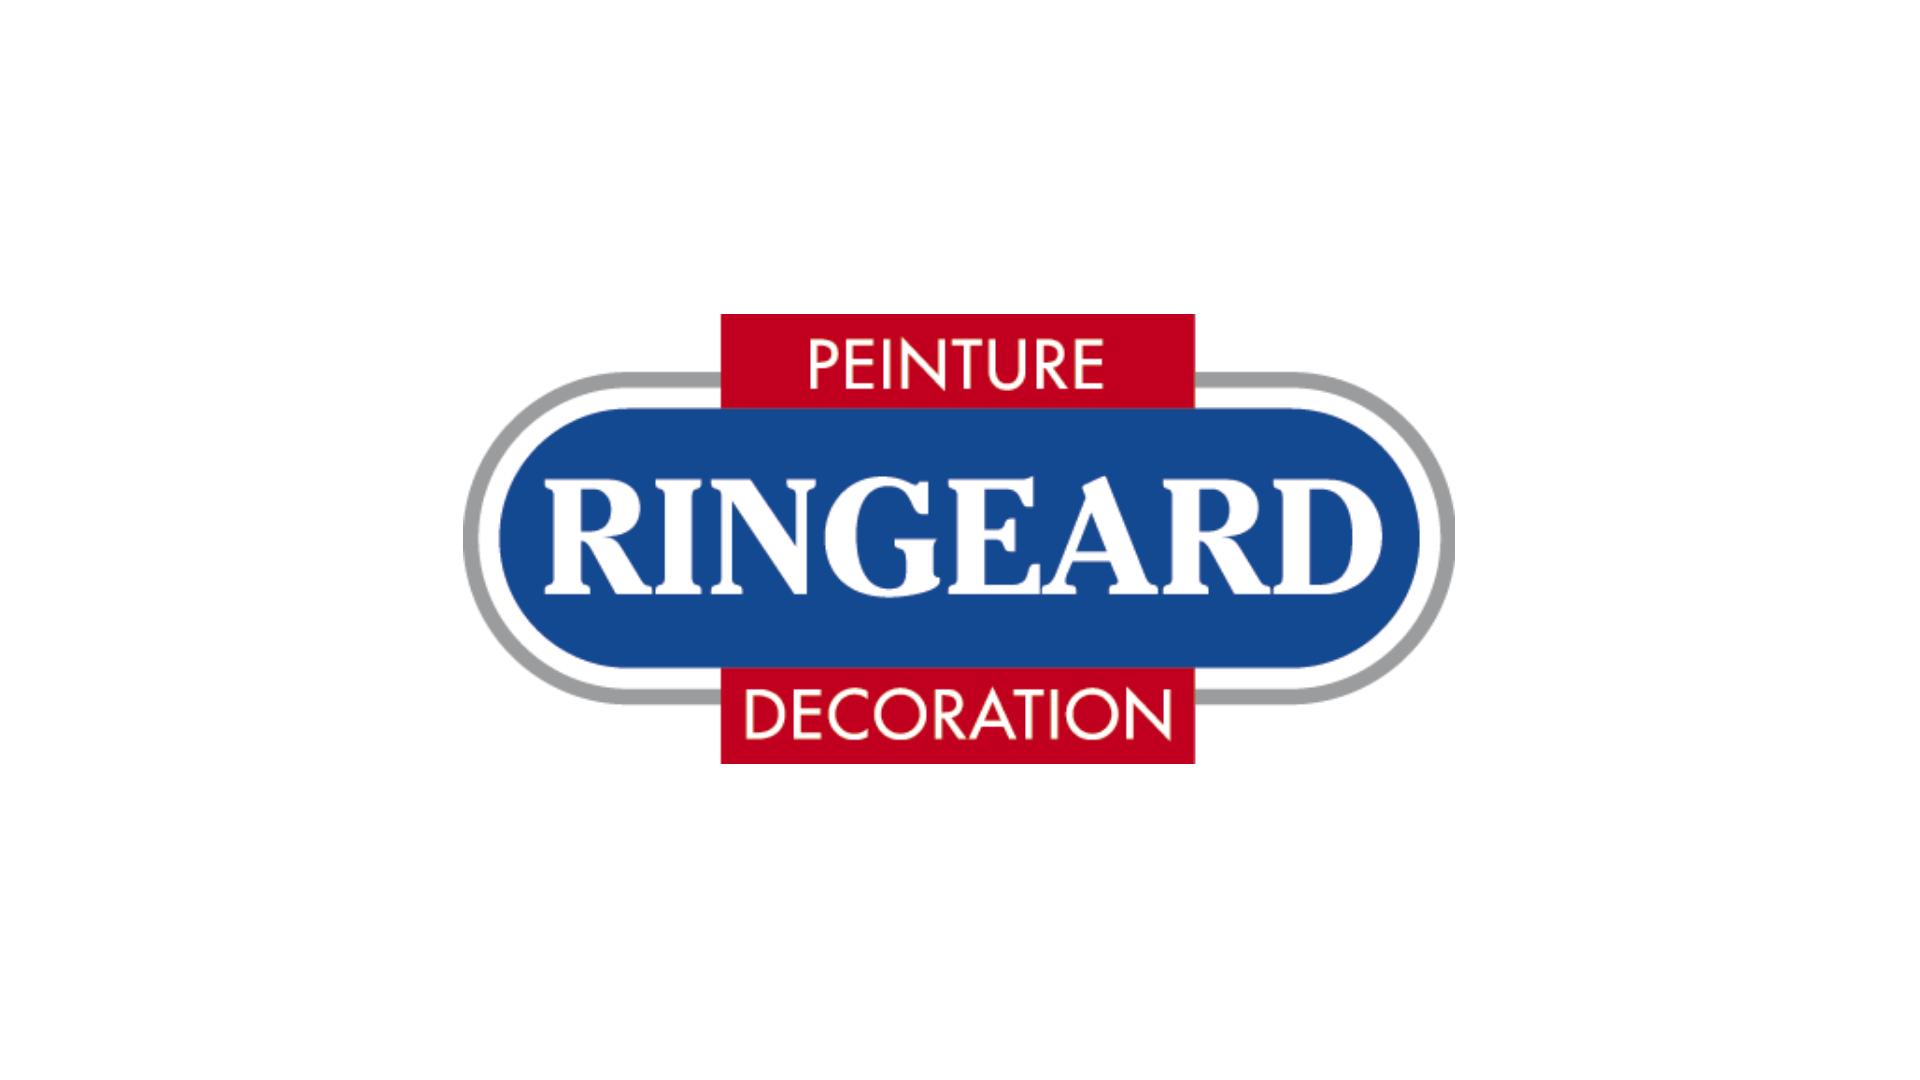 ringeard dÉcoration